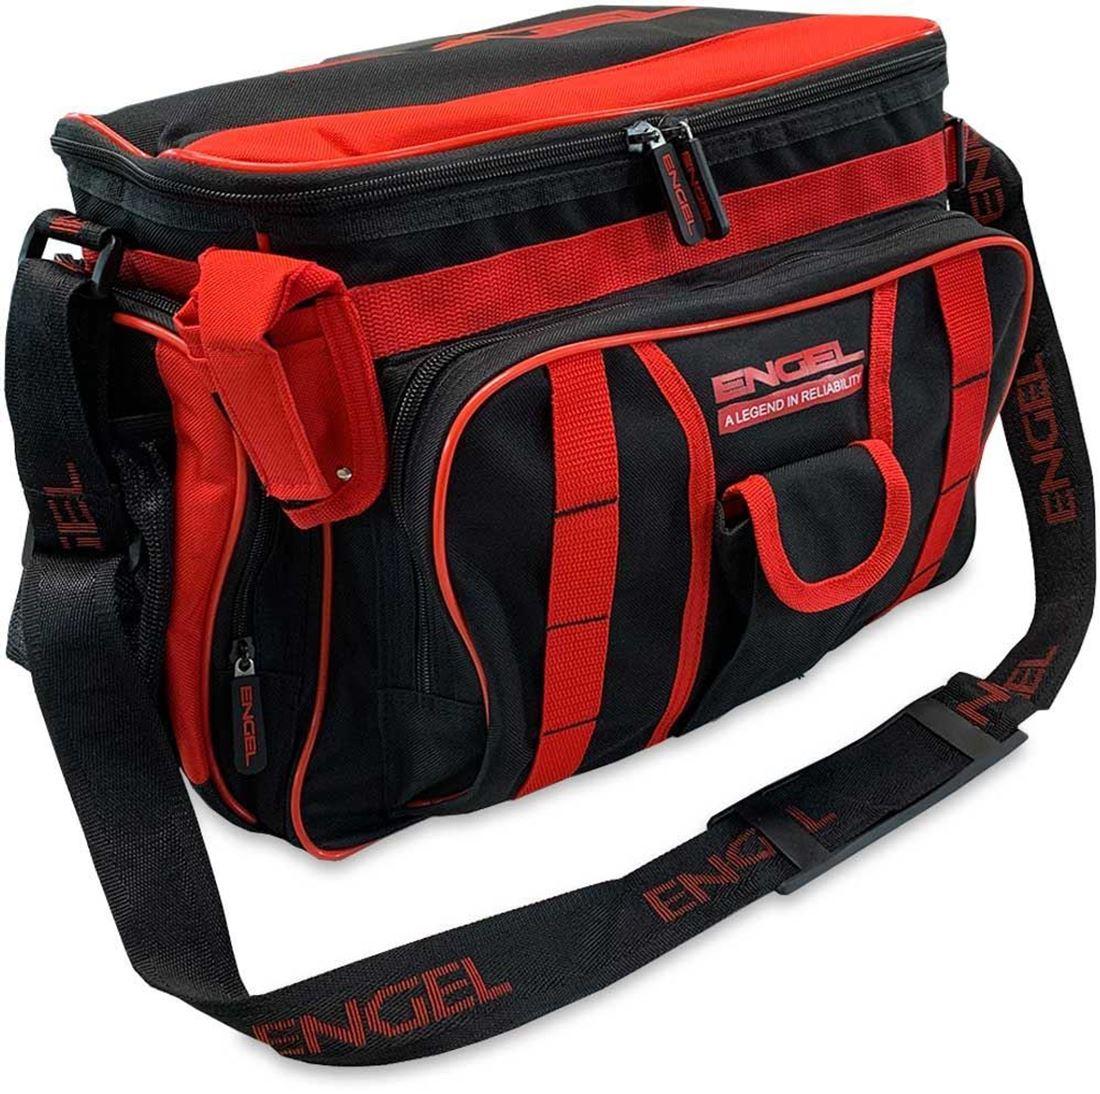 Engel Fishing & Cooler Bag